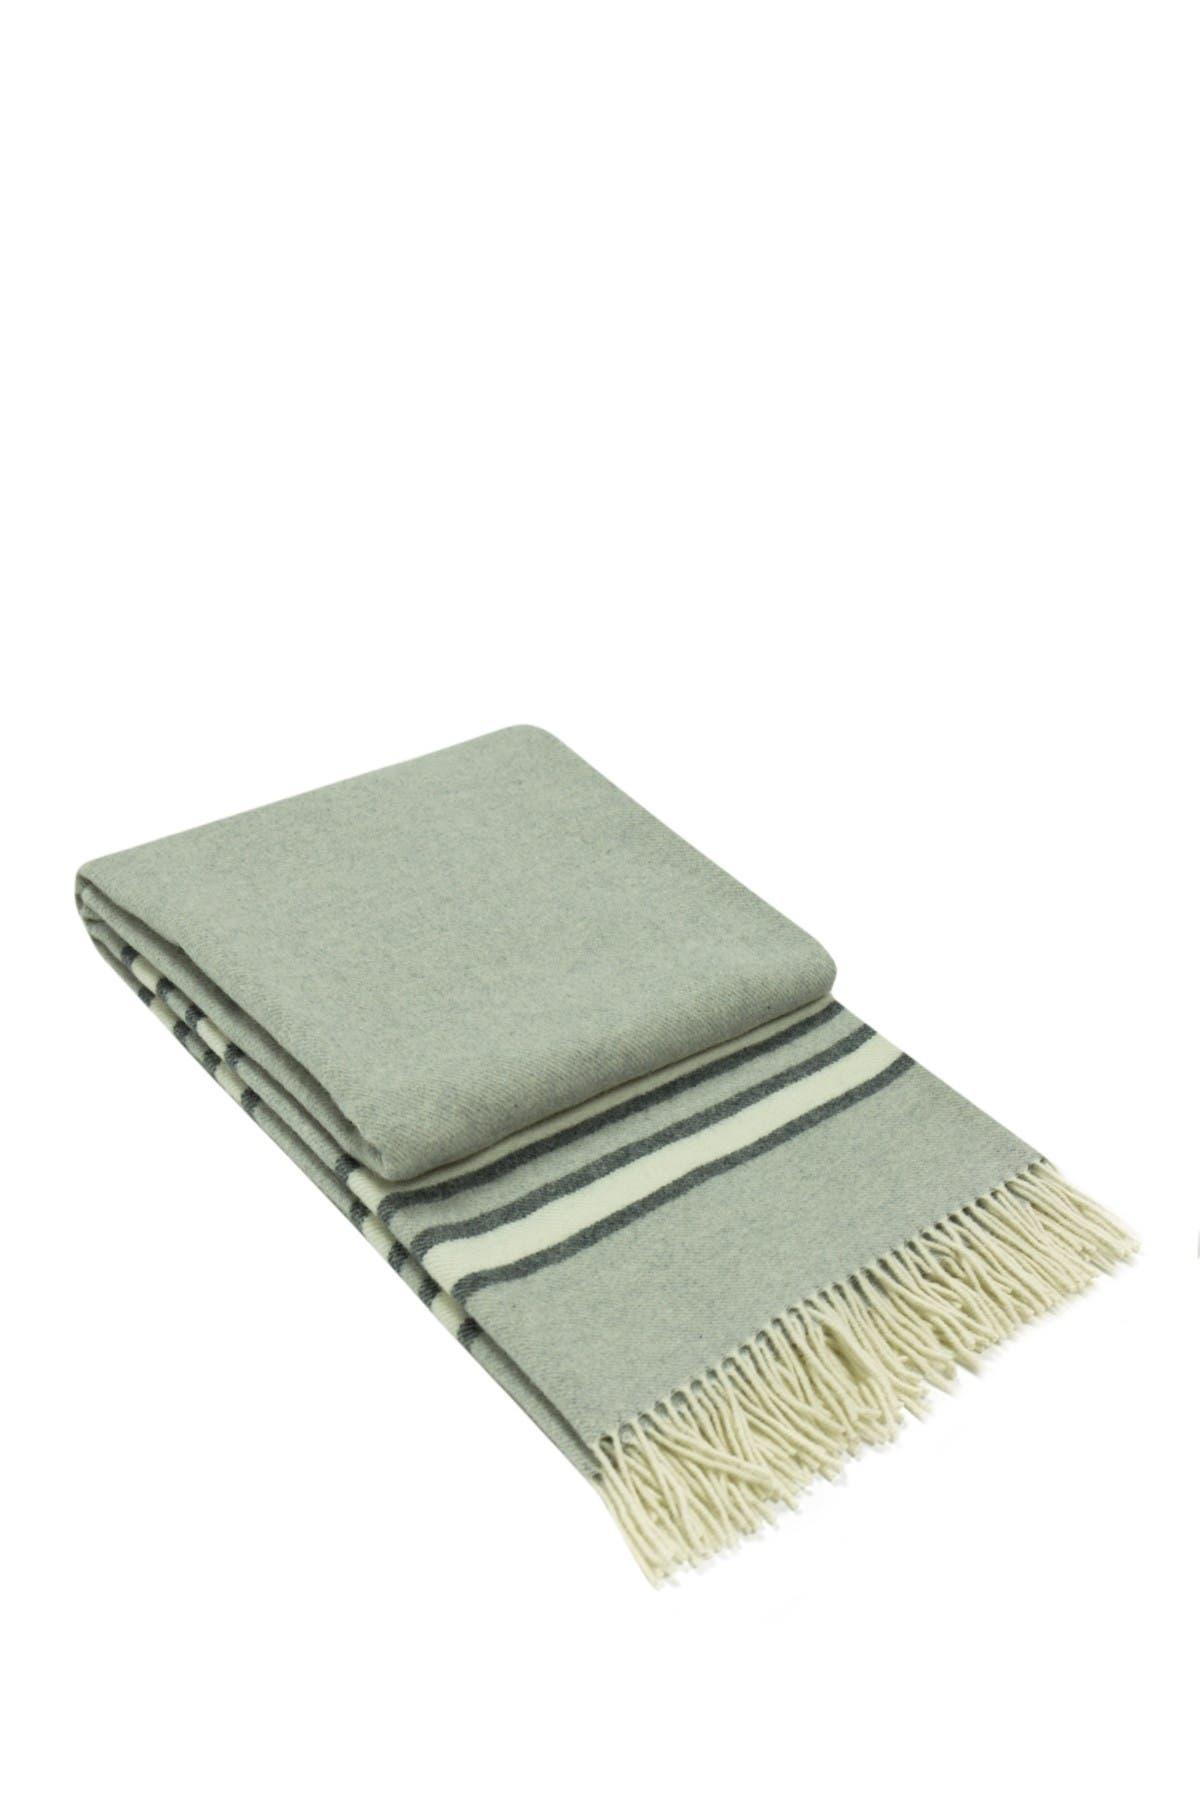 Image of Melange Home Italian Wool Blend Throw - Light Grey